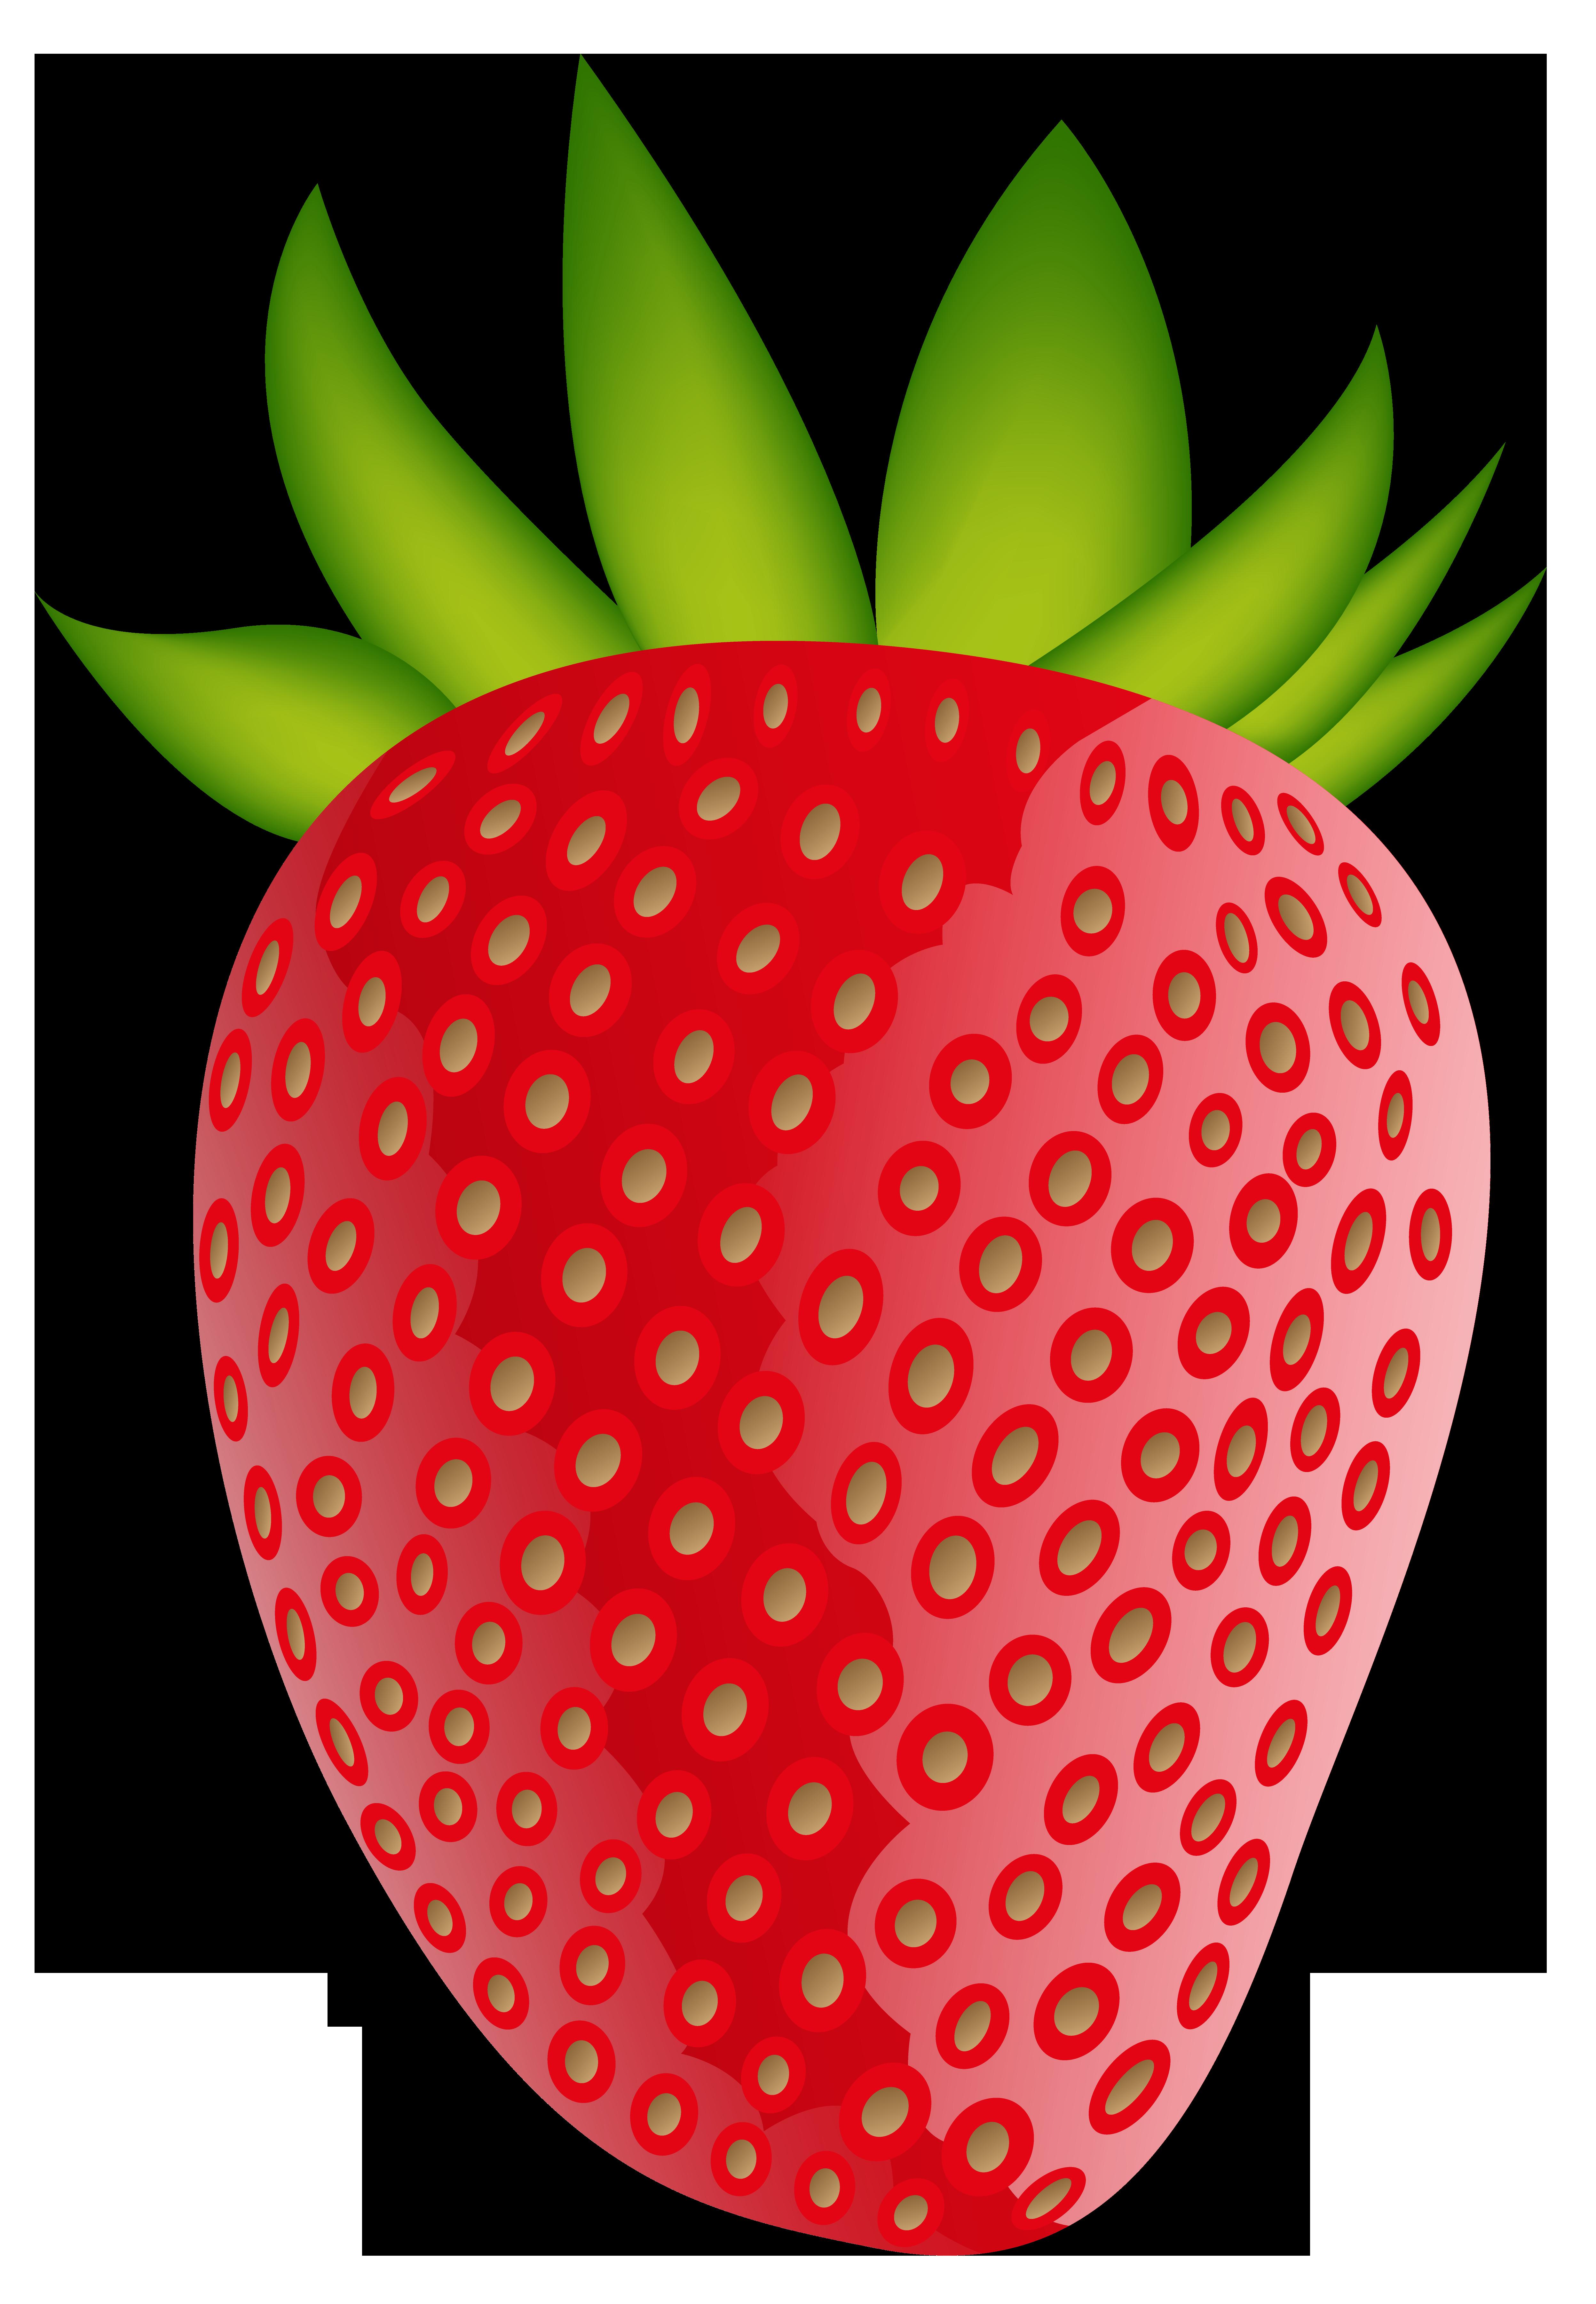 4990x7203 Strawberry Png Clip Artt Imageu200b Gallery Yopriceville